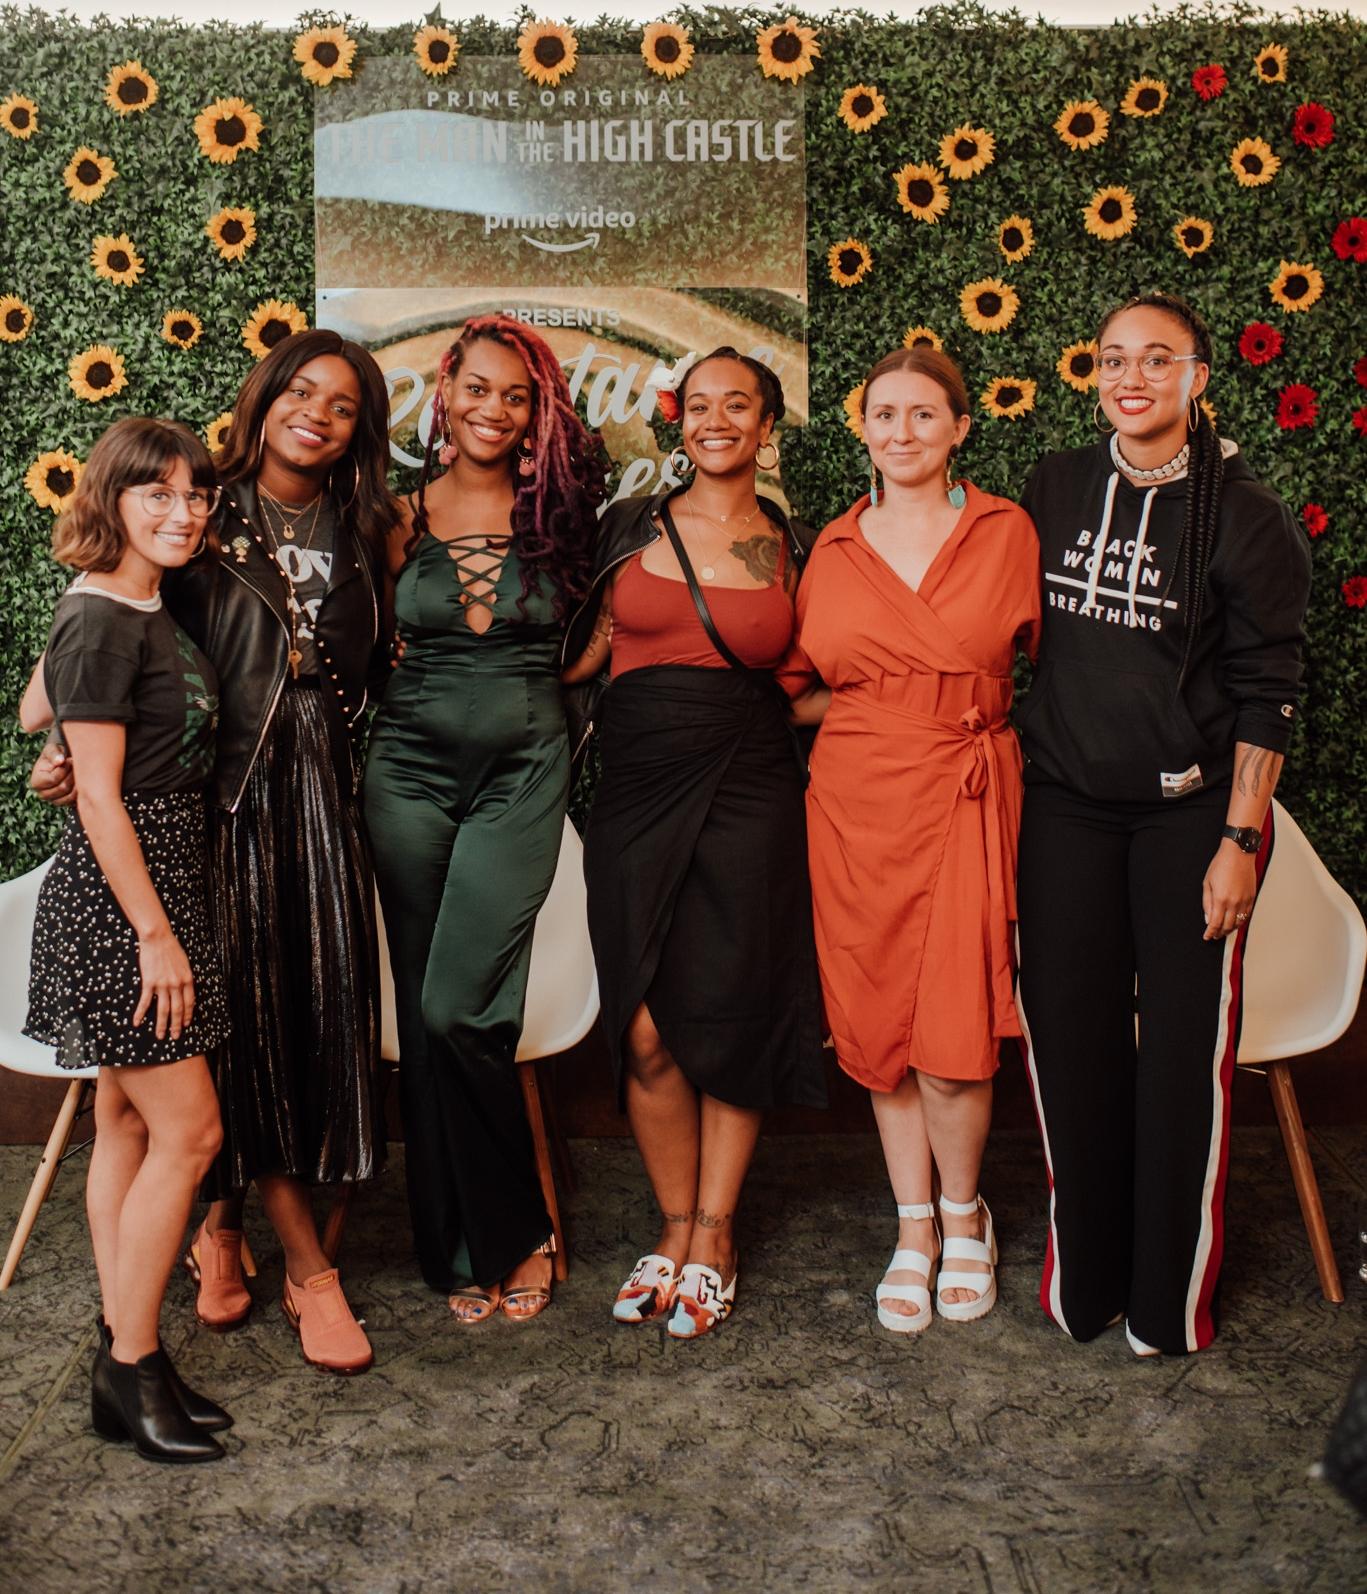 Resistance Rising Panelists & Curator - From Left to right: Brittany Packnett, Brandi Chantalle, Alex Elle, Katalina Mayorga, Randi Gloss